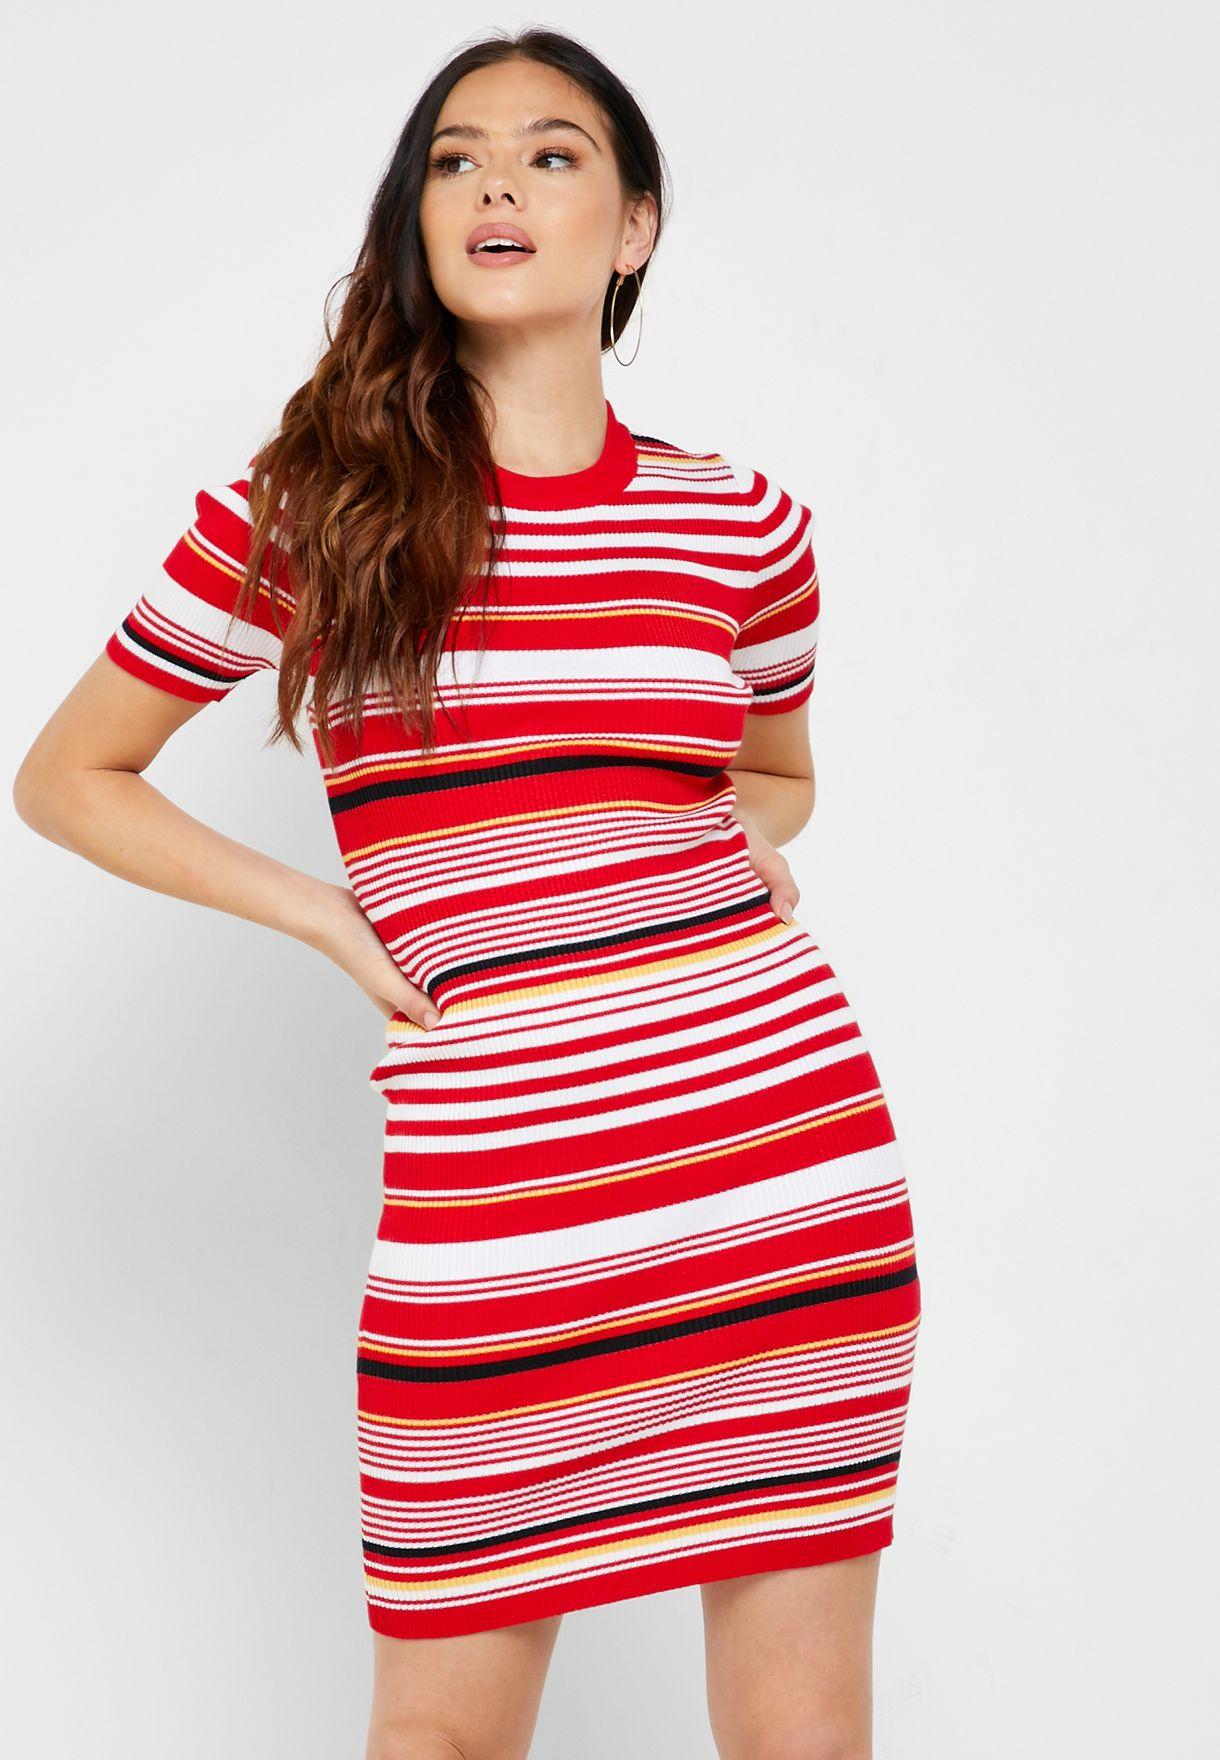 فستان بديكون مخطط